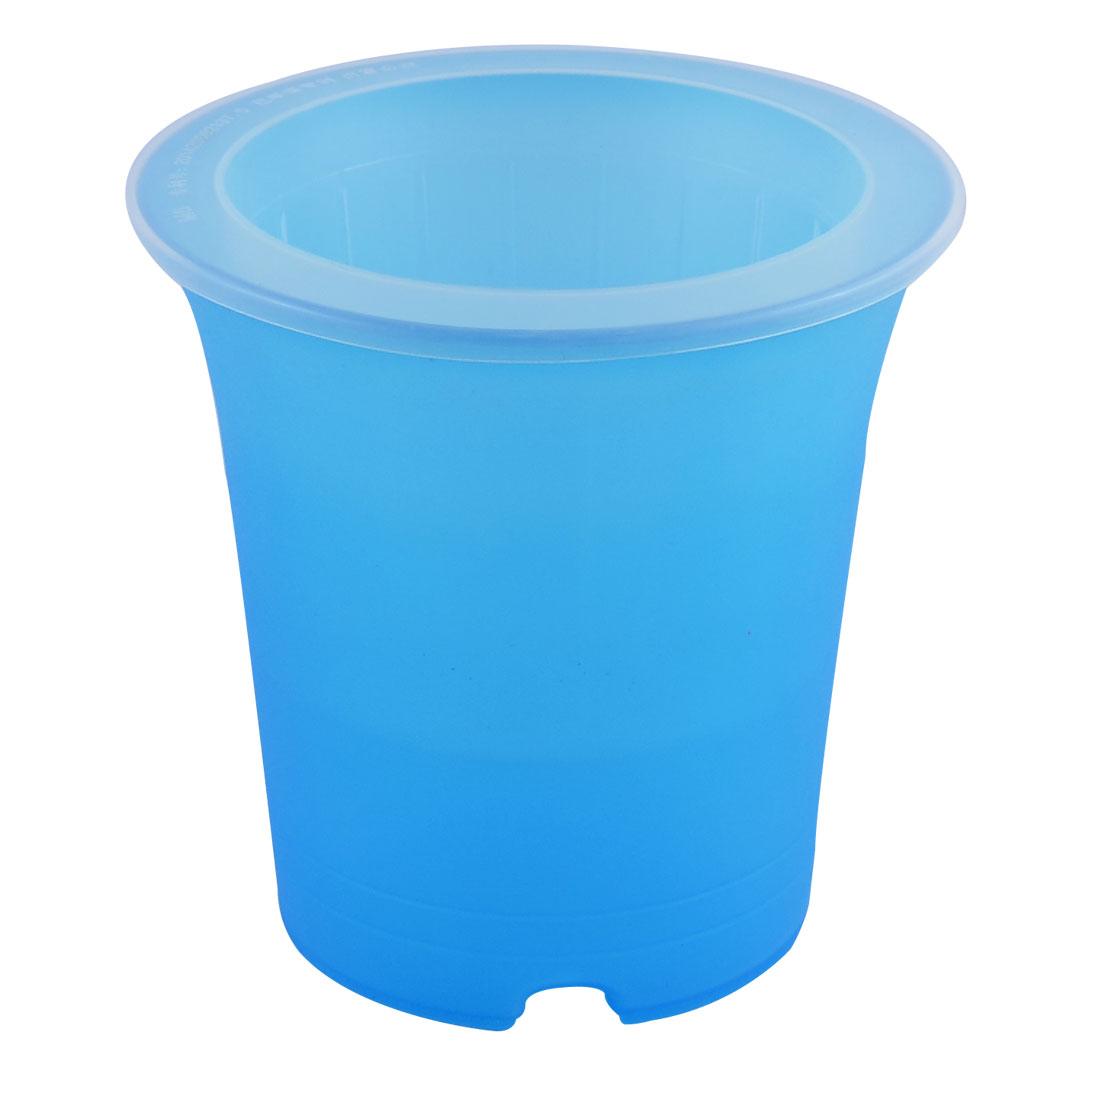 Desktop Decor Plastic Cylinder Shape Self Watering Planter Flowerpot Blue